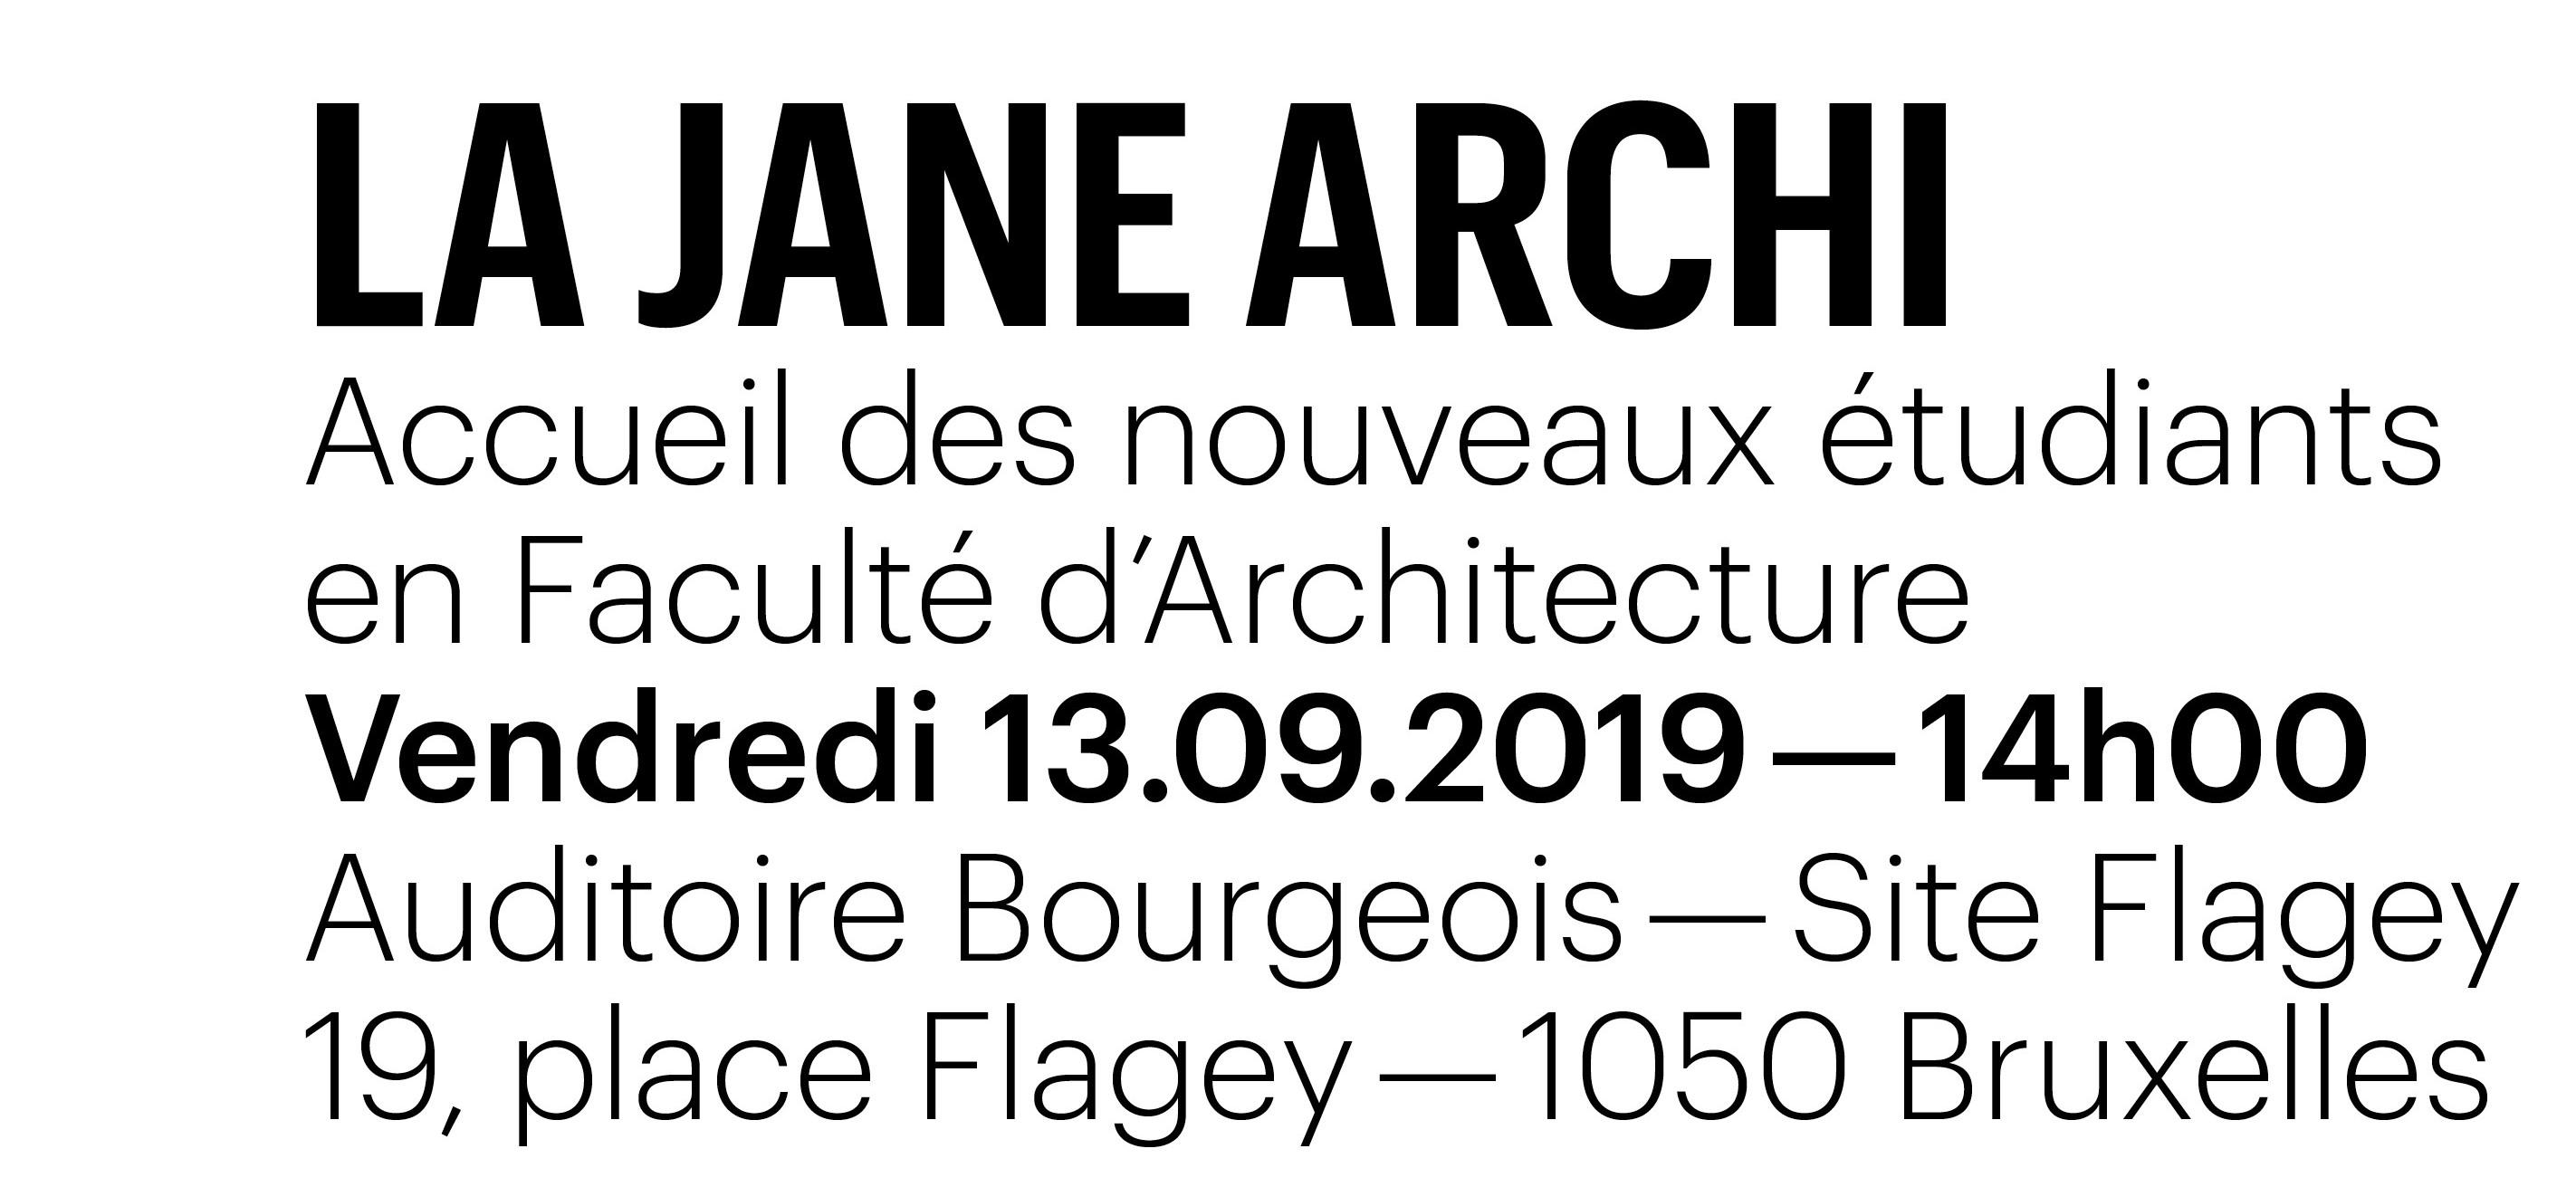 La Jane Archi 2019